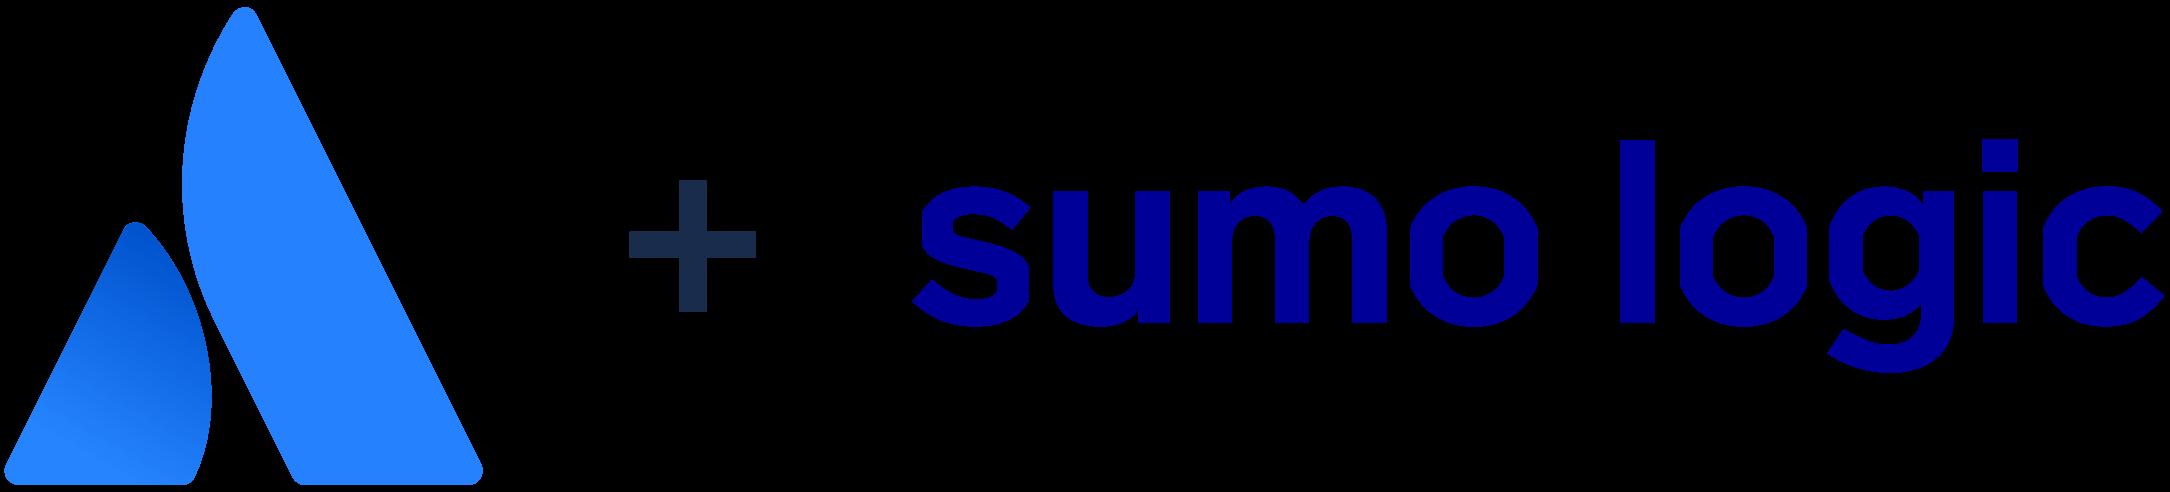 Atlassian 徽标 + Sumo Logic 徽标